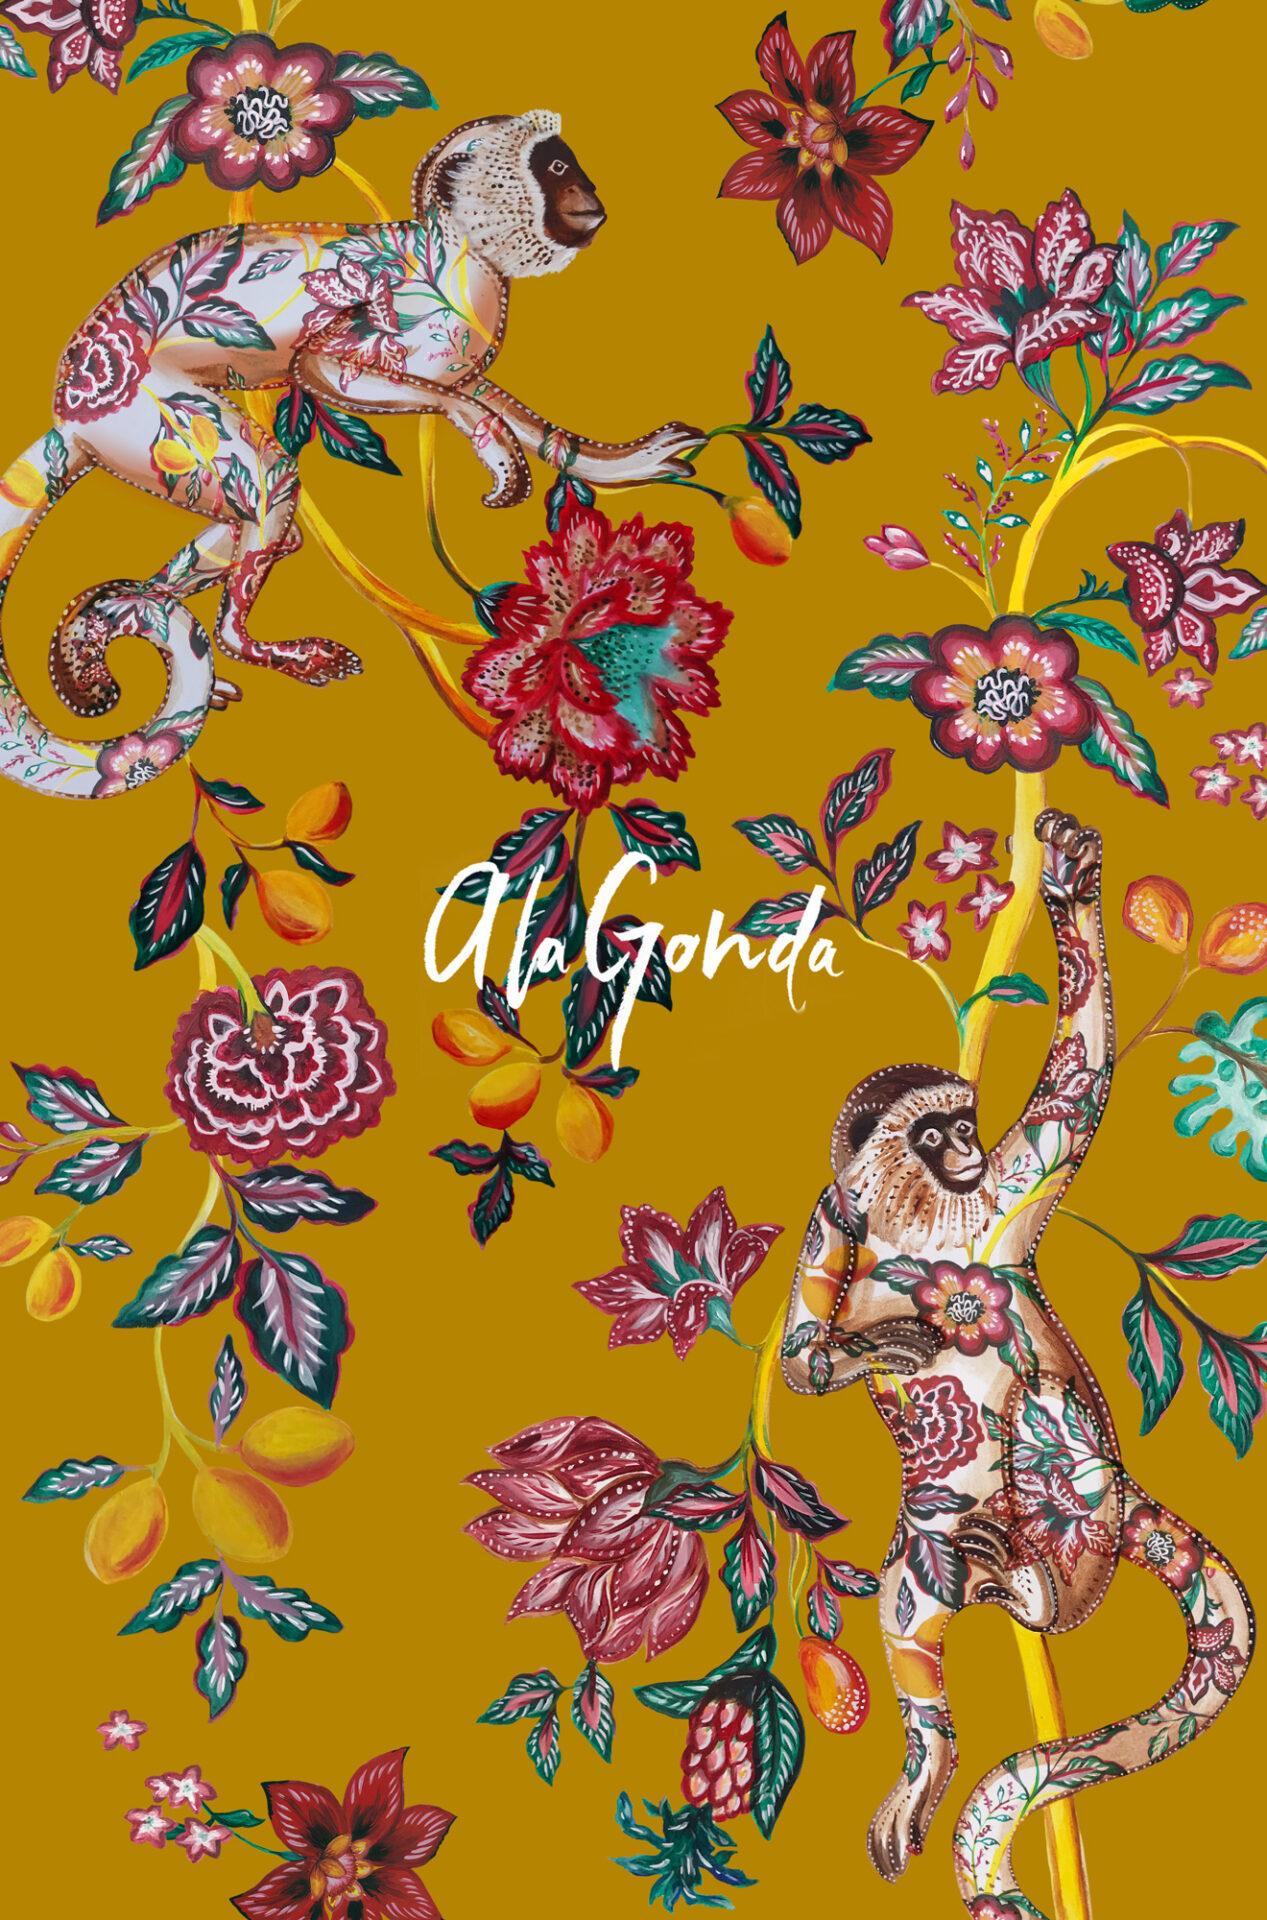 jungle-monkeys-alagonda-designs-4